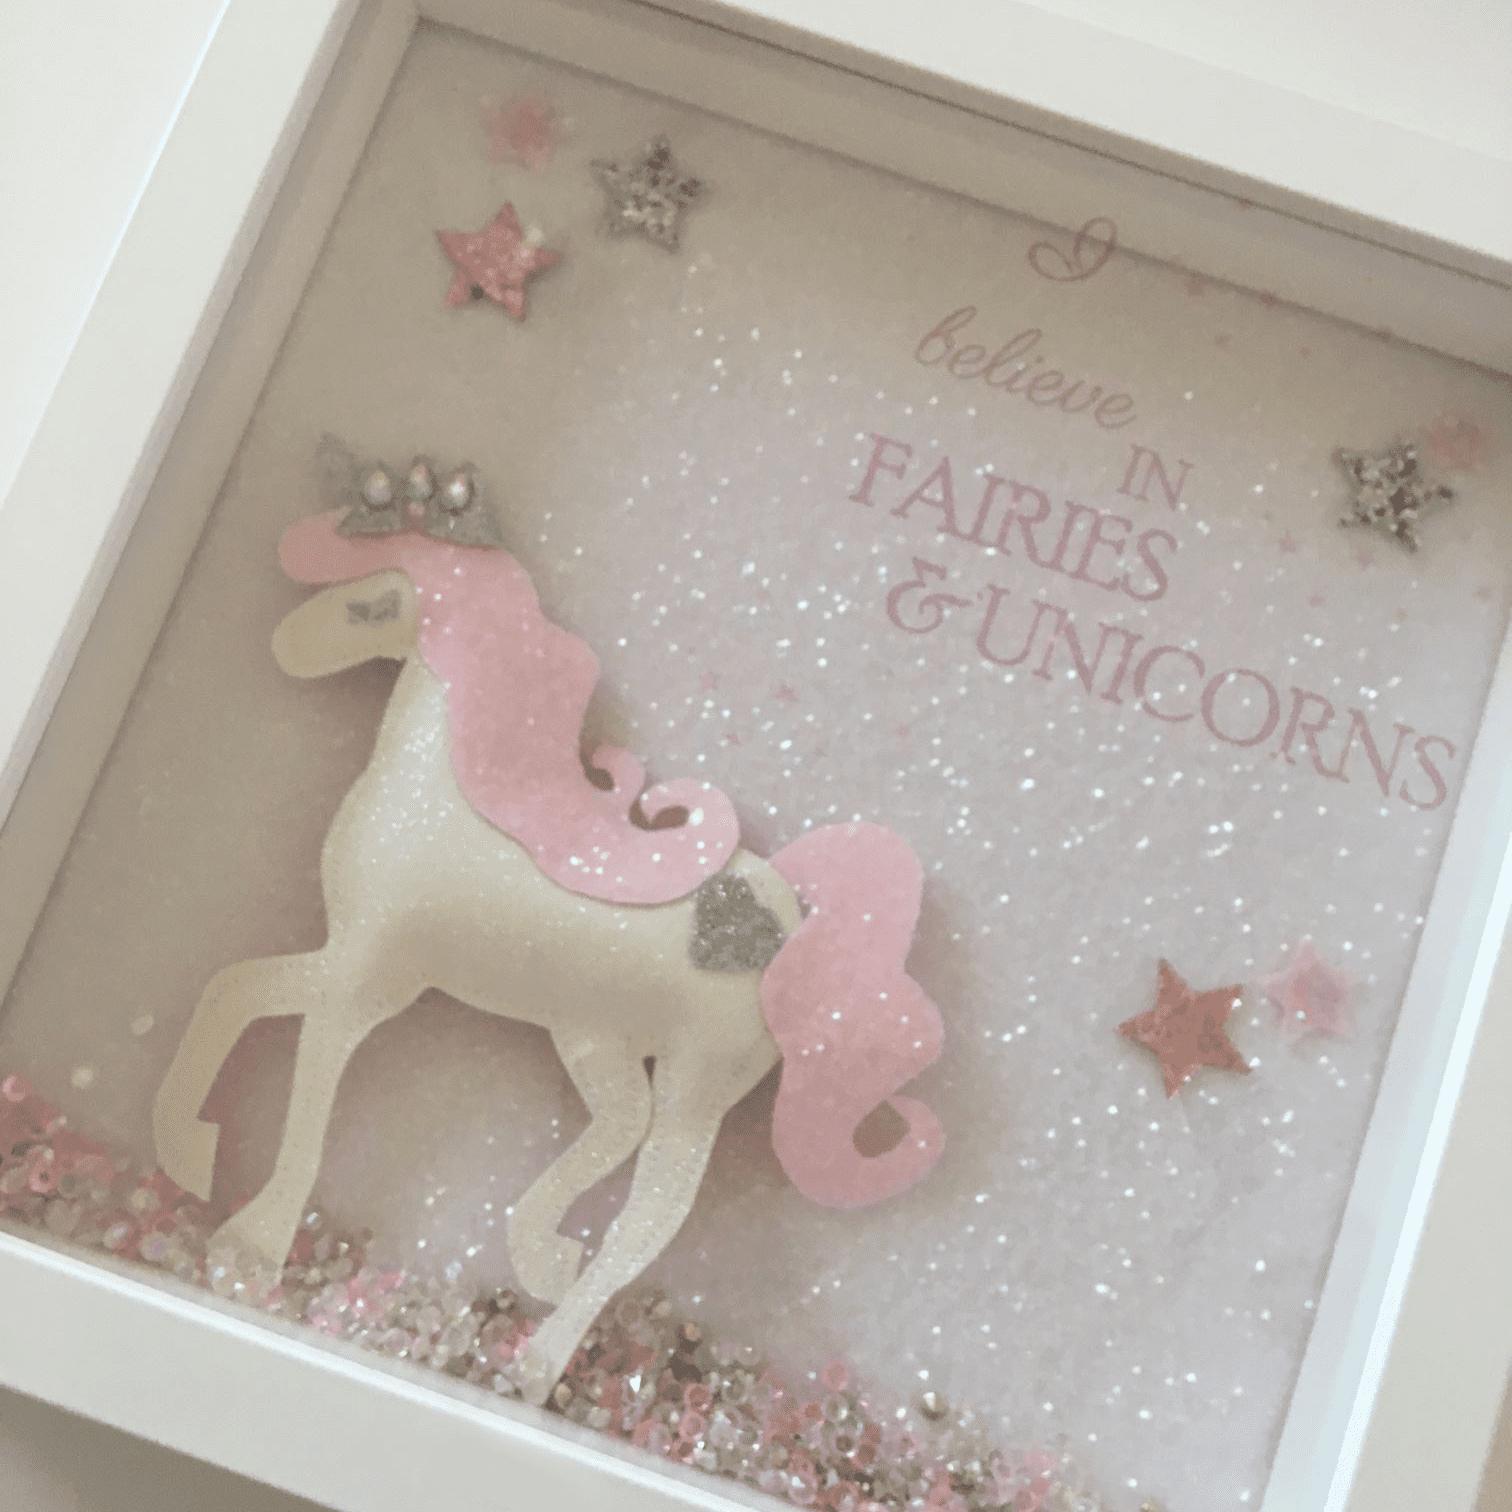 'I Believe in Fairies & Unicorns' Full Glitter Frame